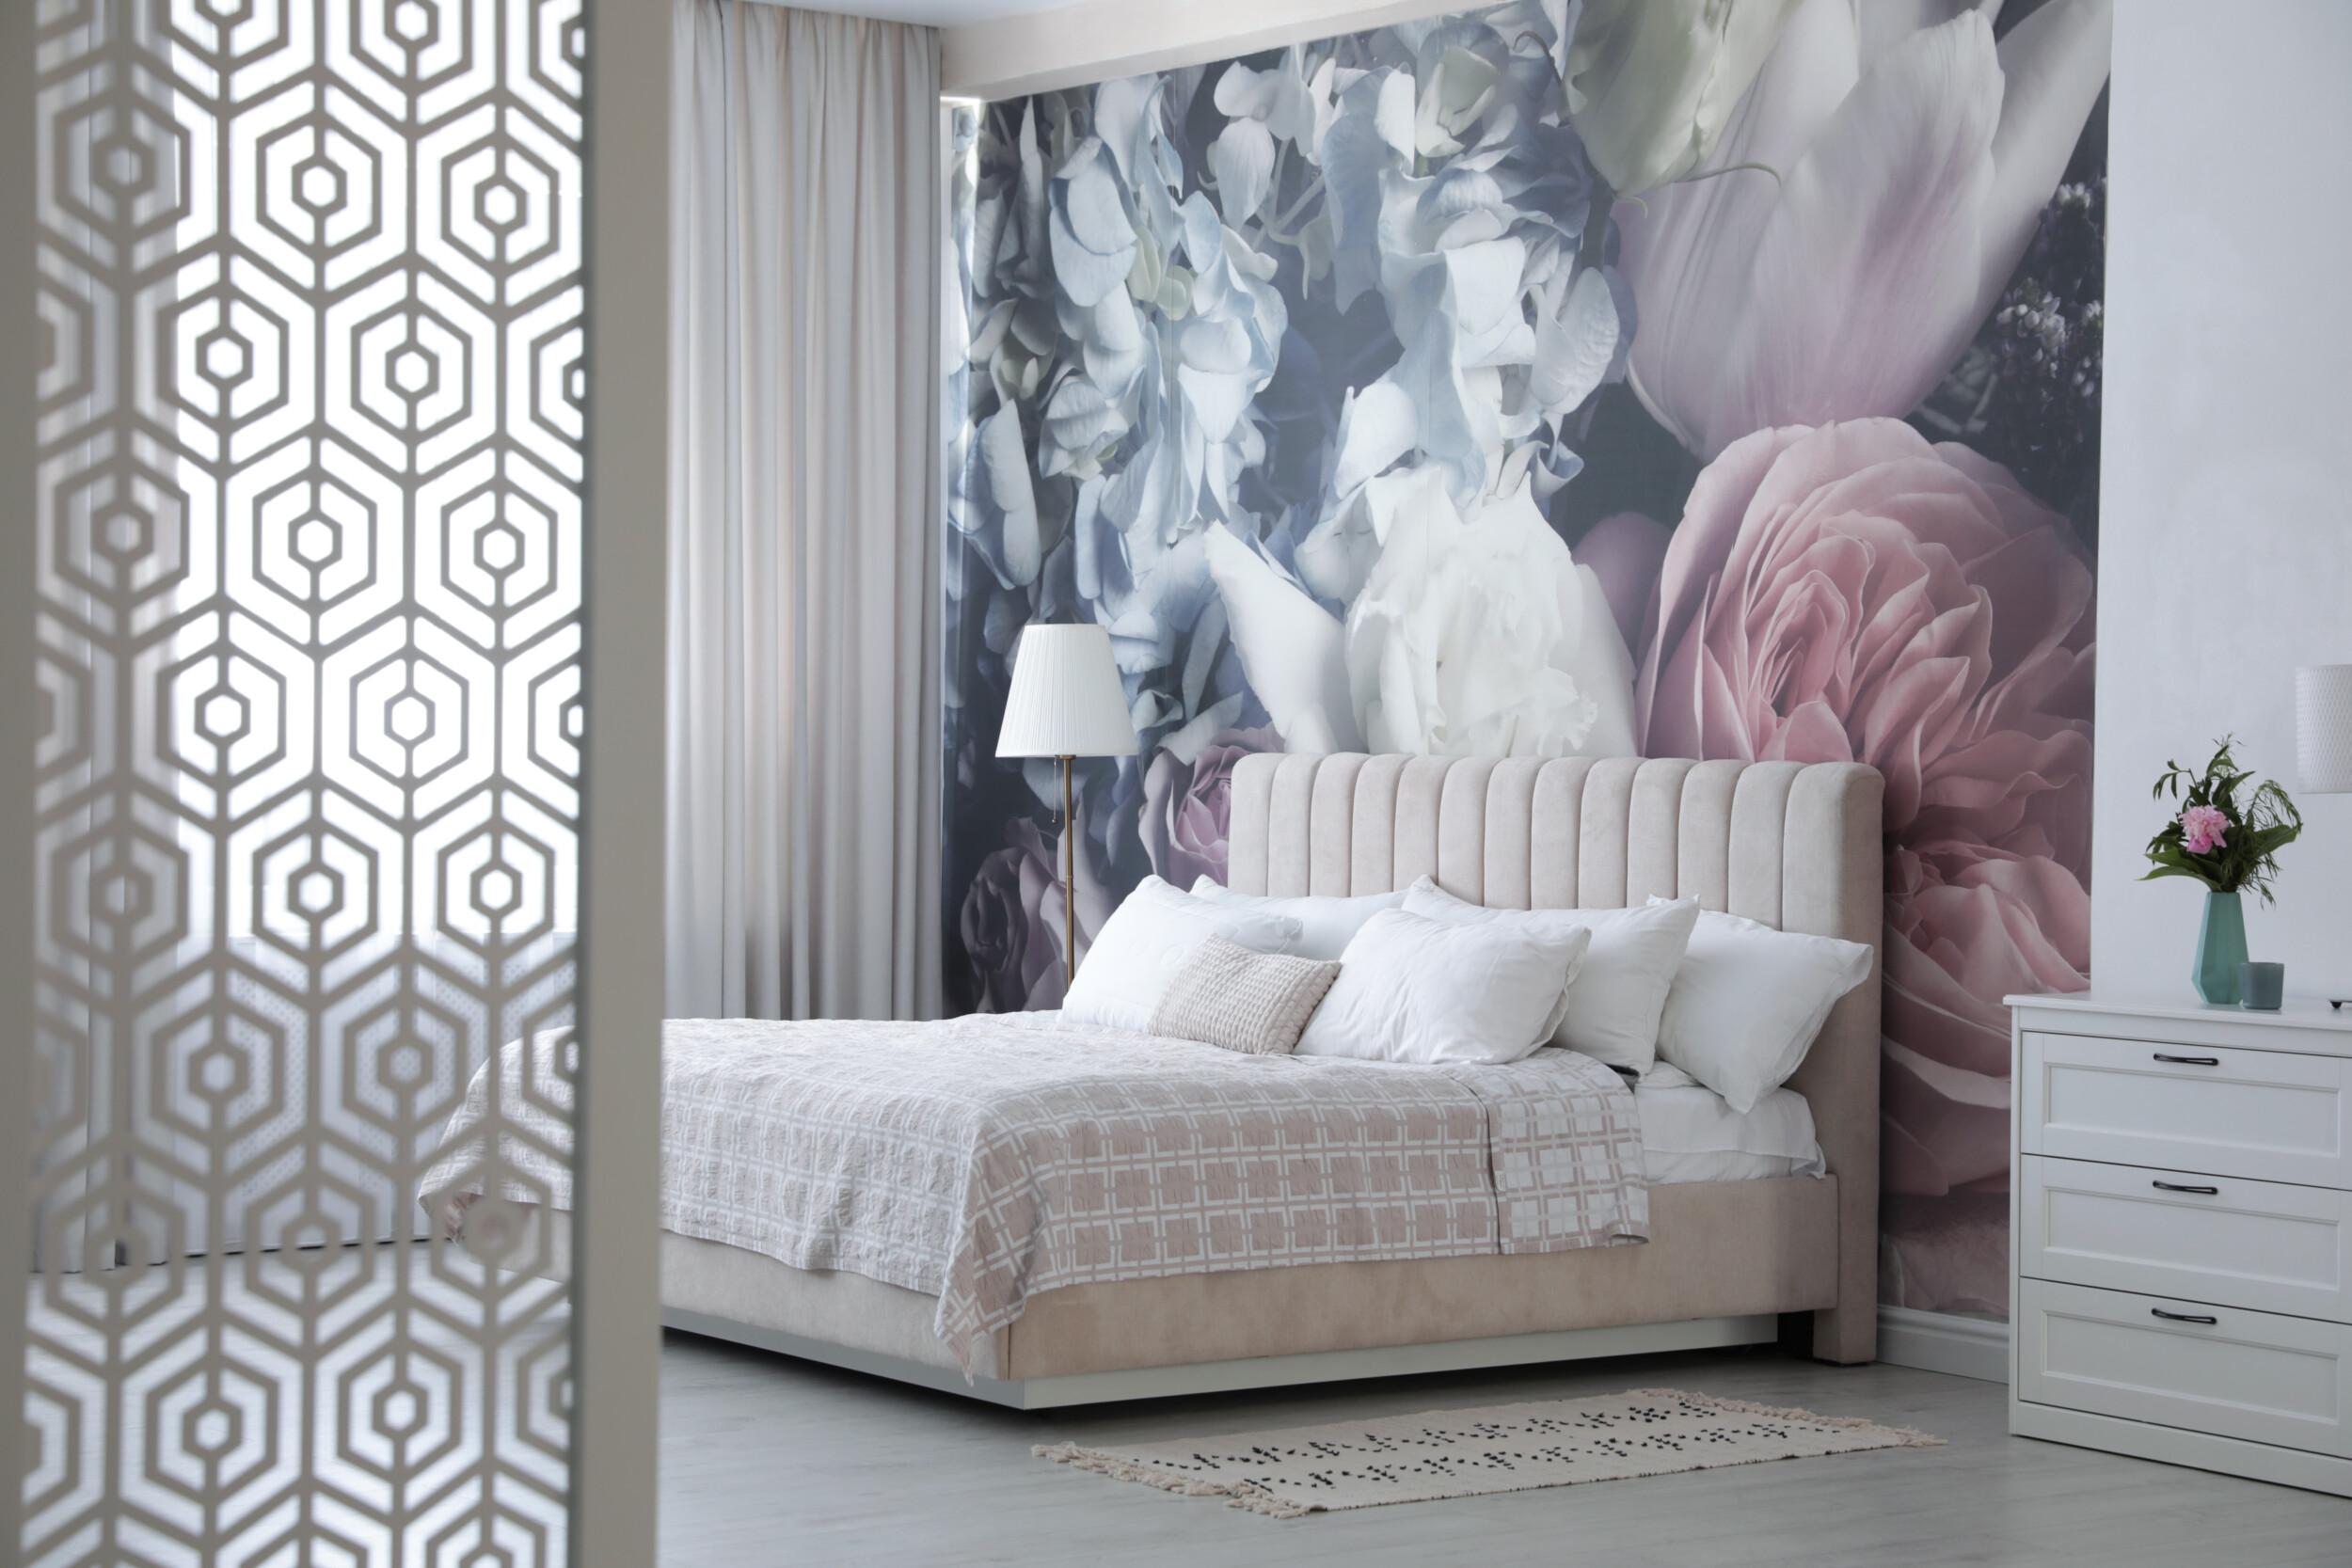 floral mural bedroom wallpaper